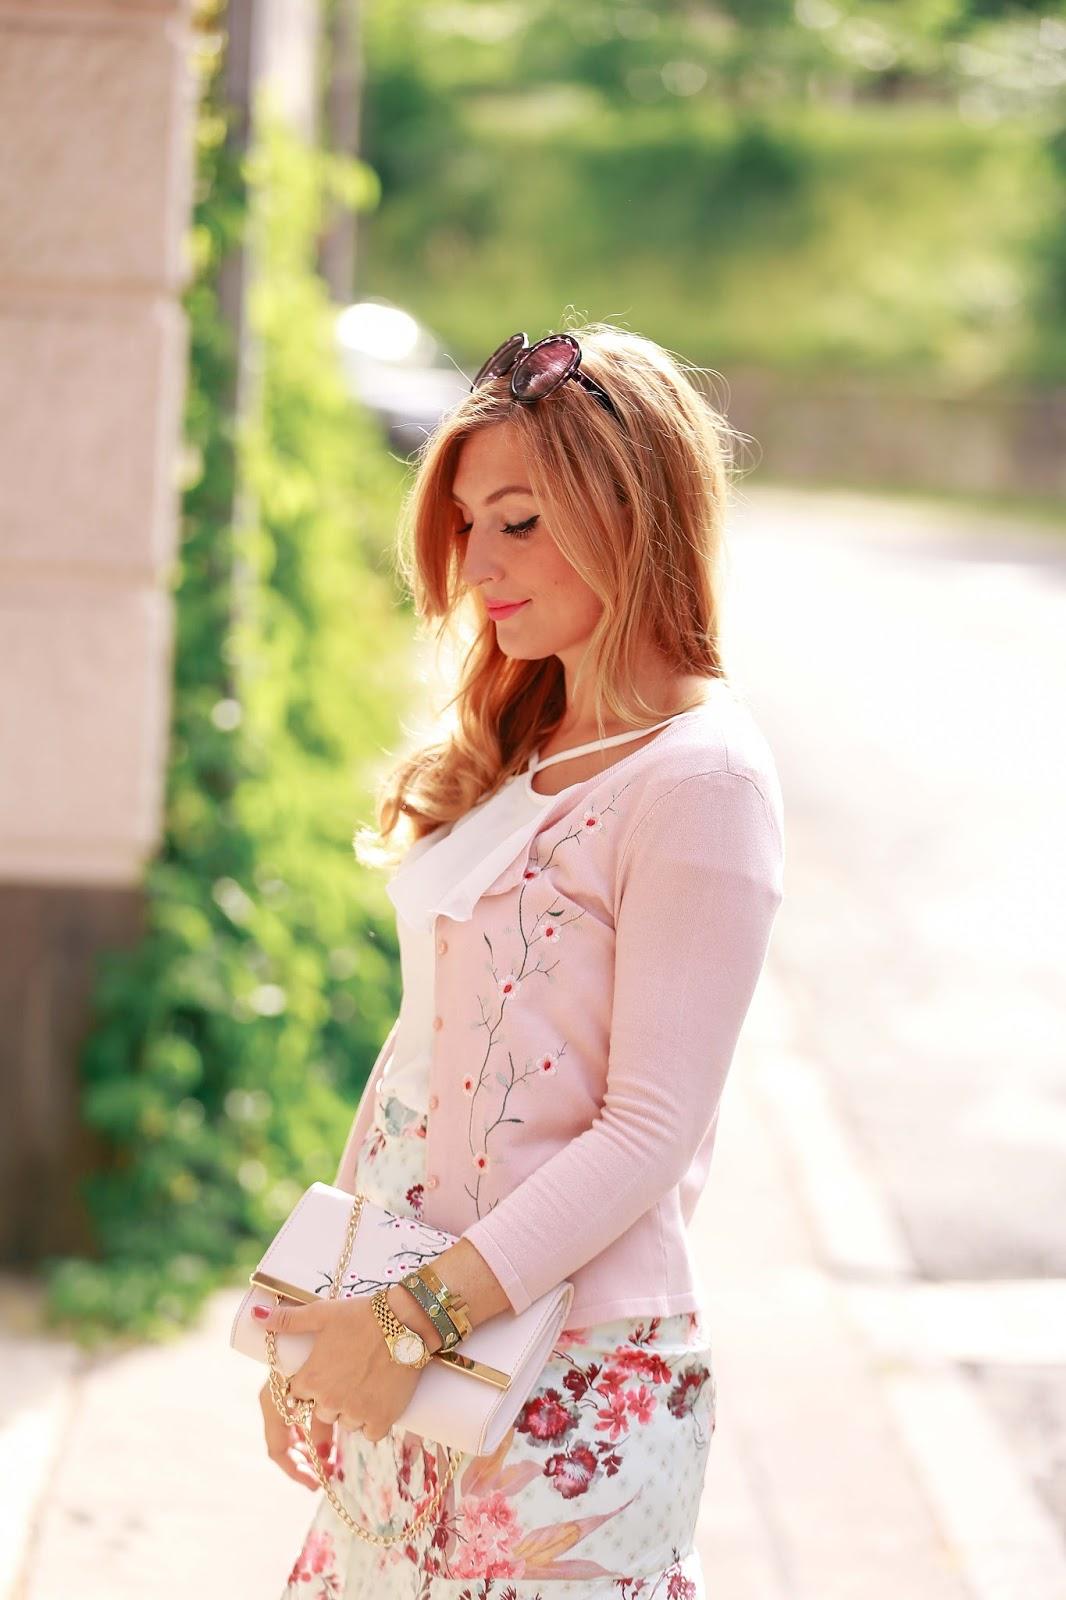 Fashionstylebyjohanna-blumenkleid-florales-kleid-nude-dress-orsay